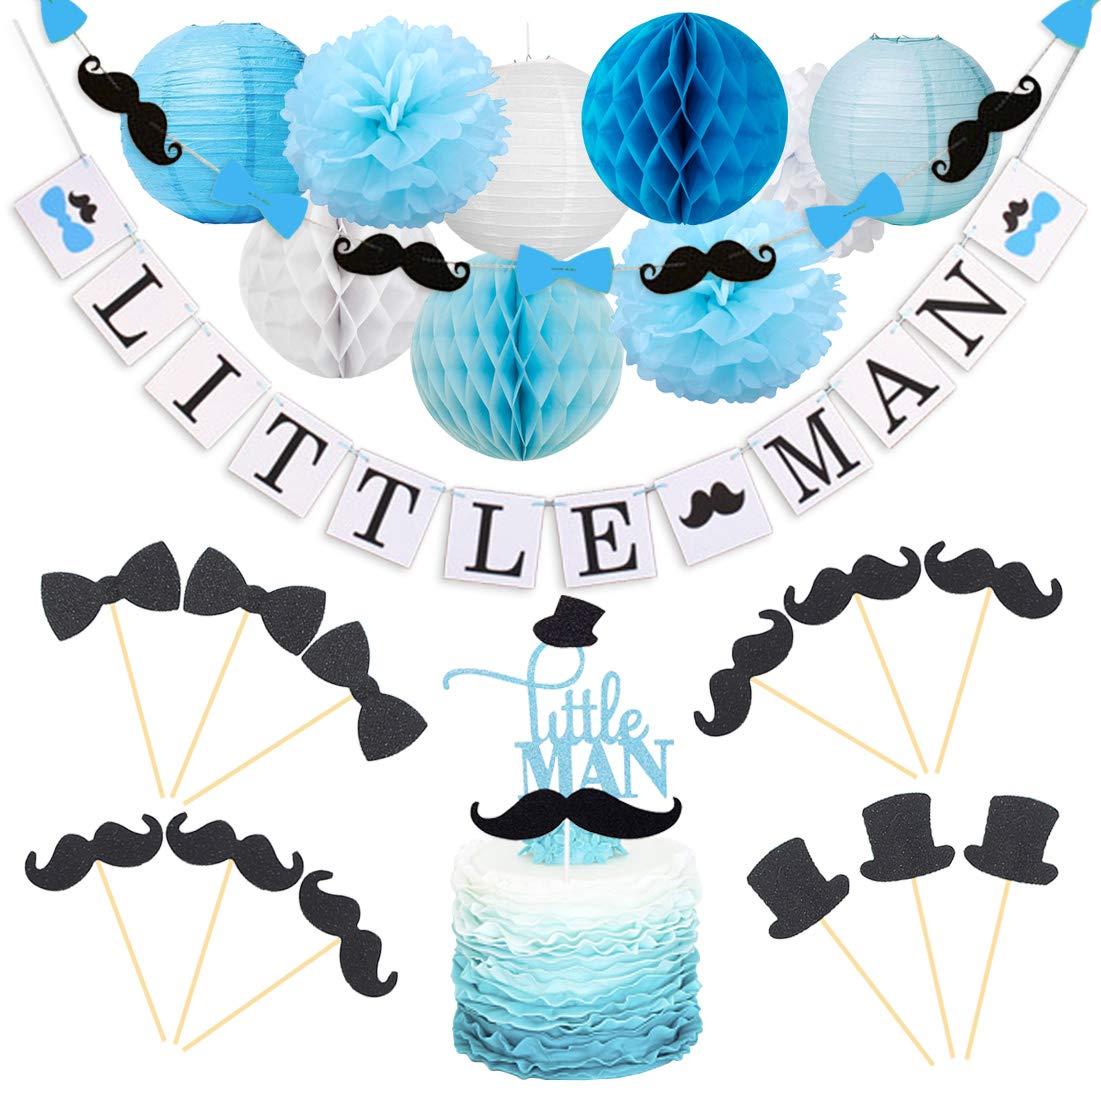 Kreatwow Decorations Mustache Cupcake Birthday